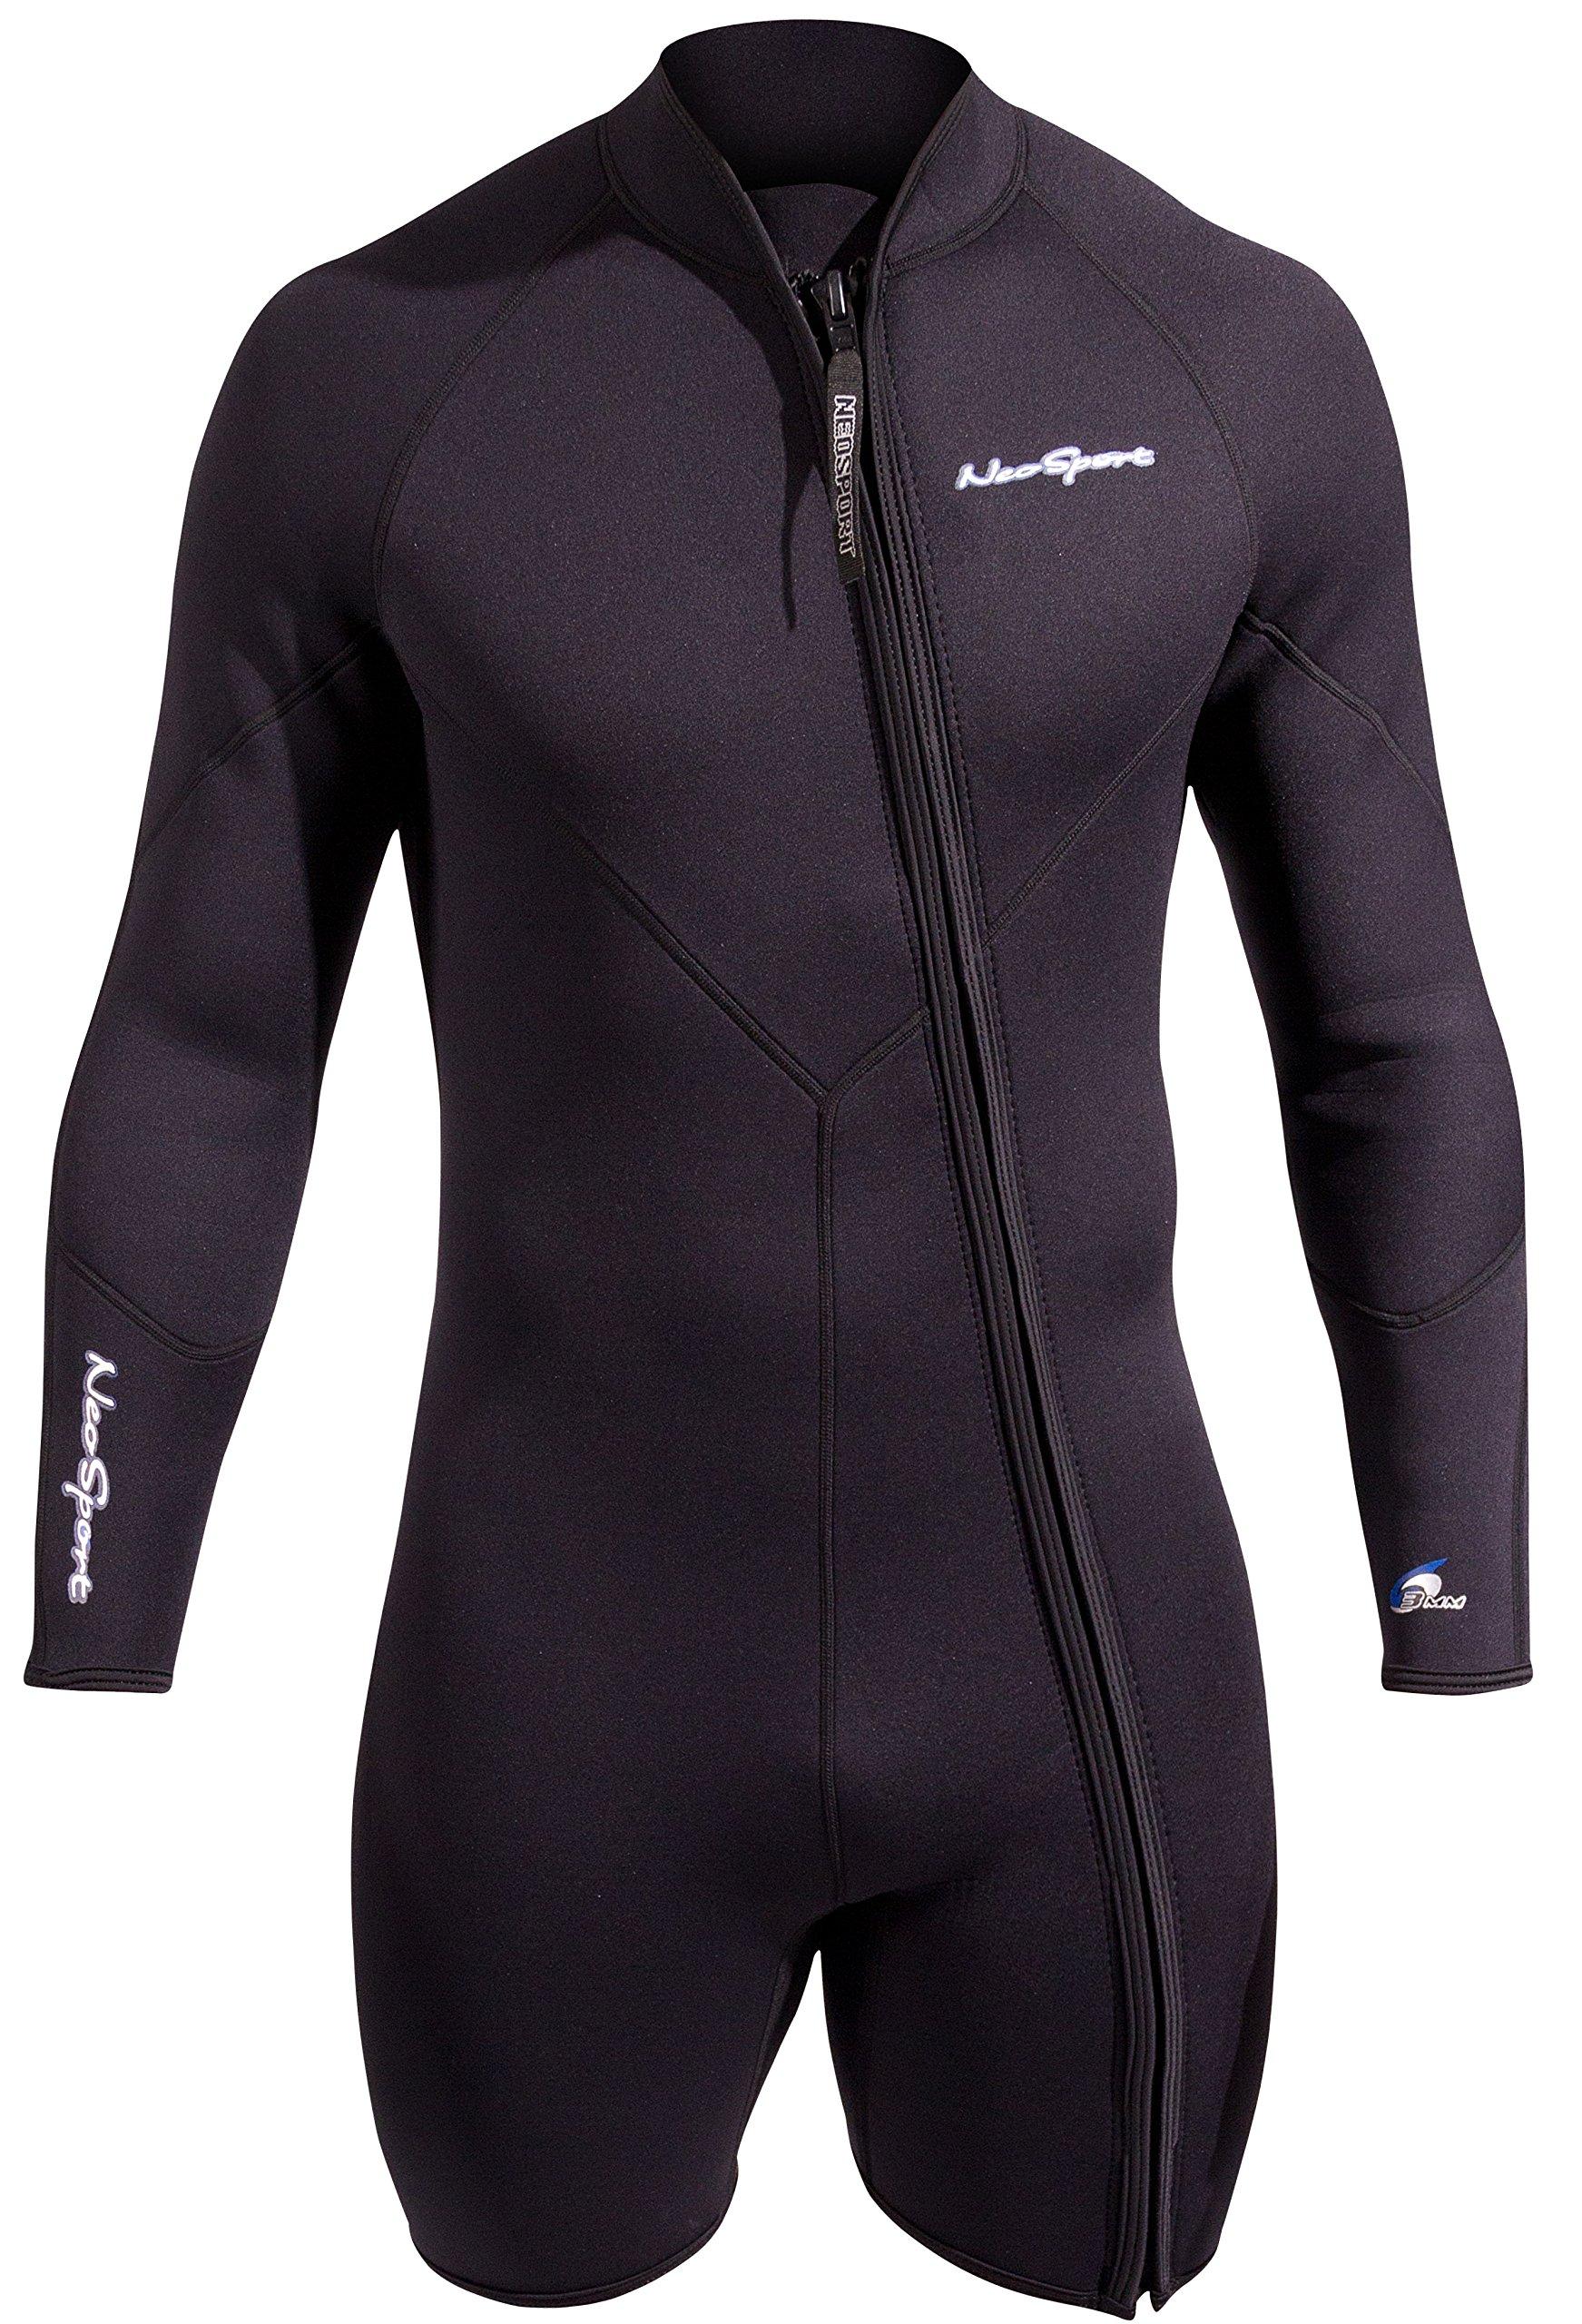 NeoSport Men's Premium Neoprene 3mm Waterman Wetsuit Jacket, 3X-Large